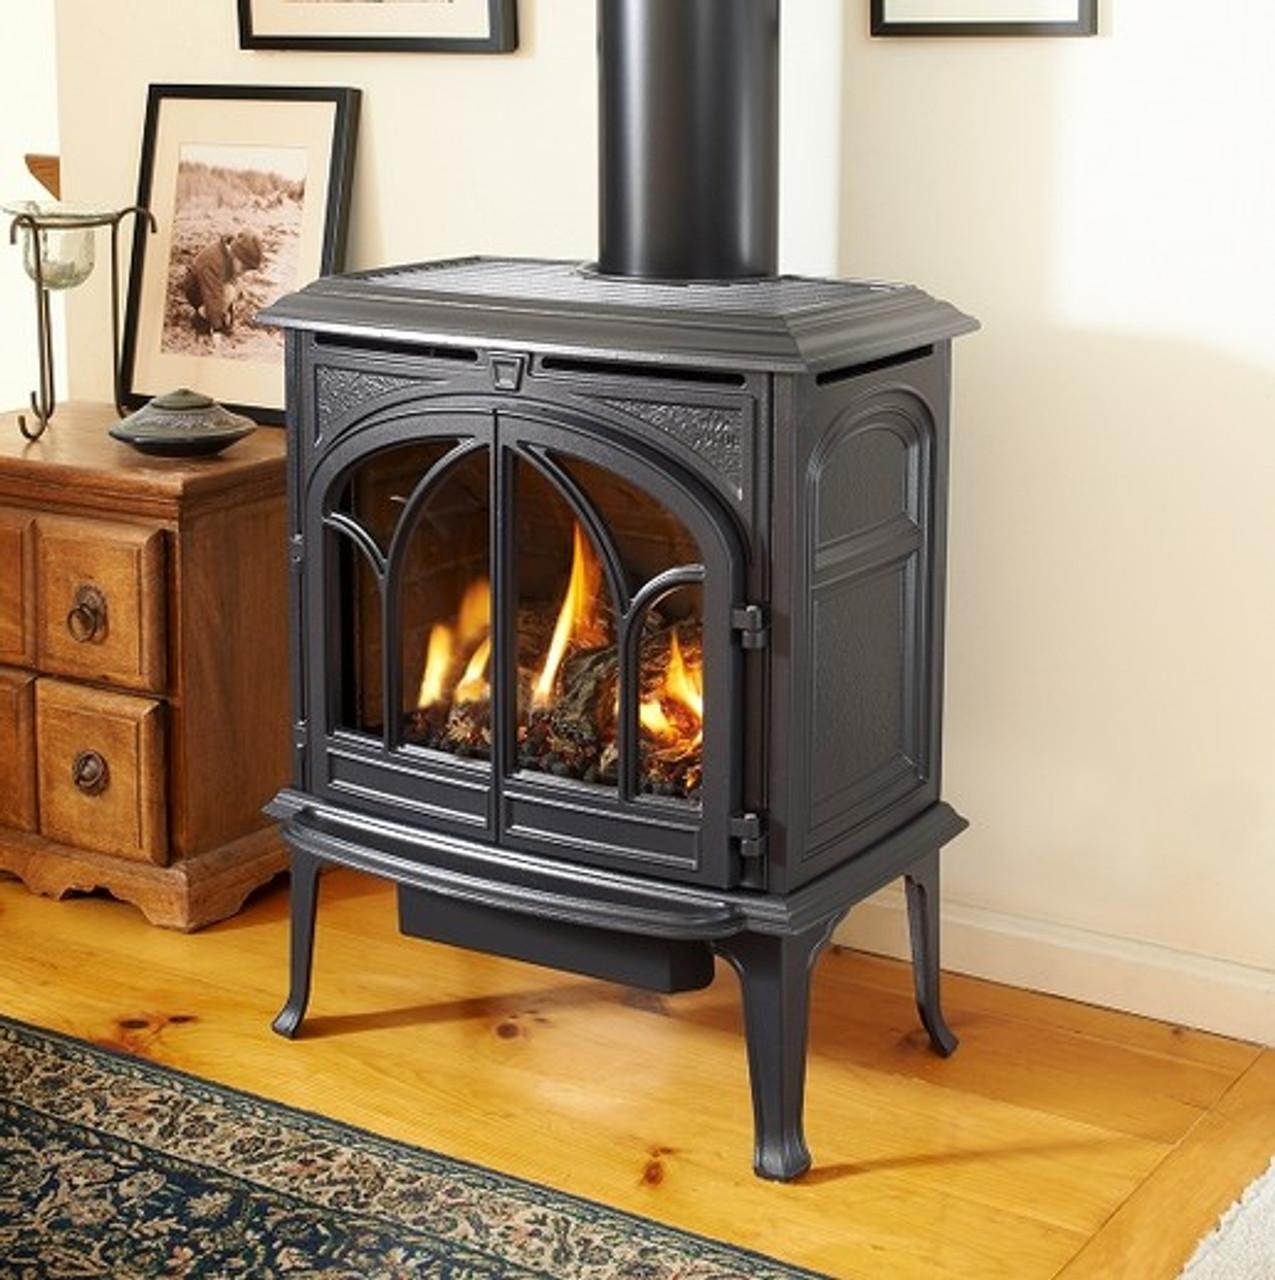 Jotul Gf300 Allagash Gas Stove Rocky Mountain Stove Fireplace